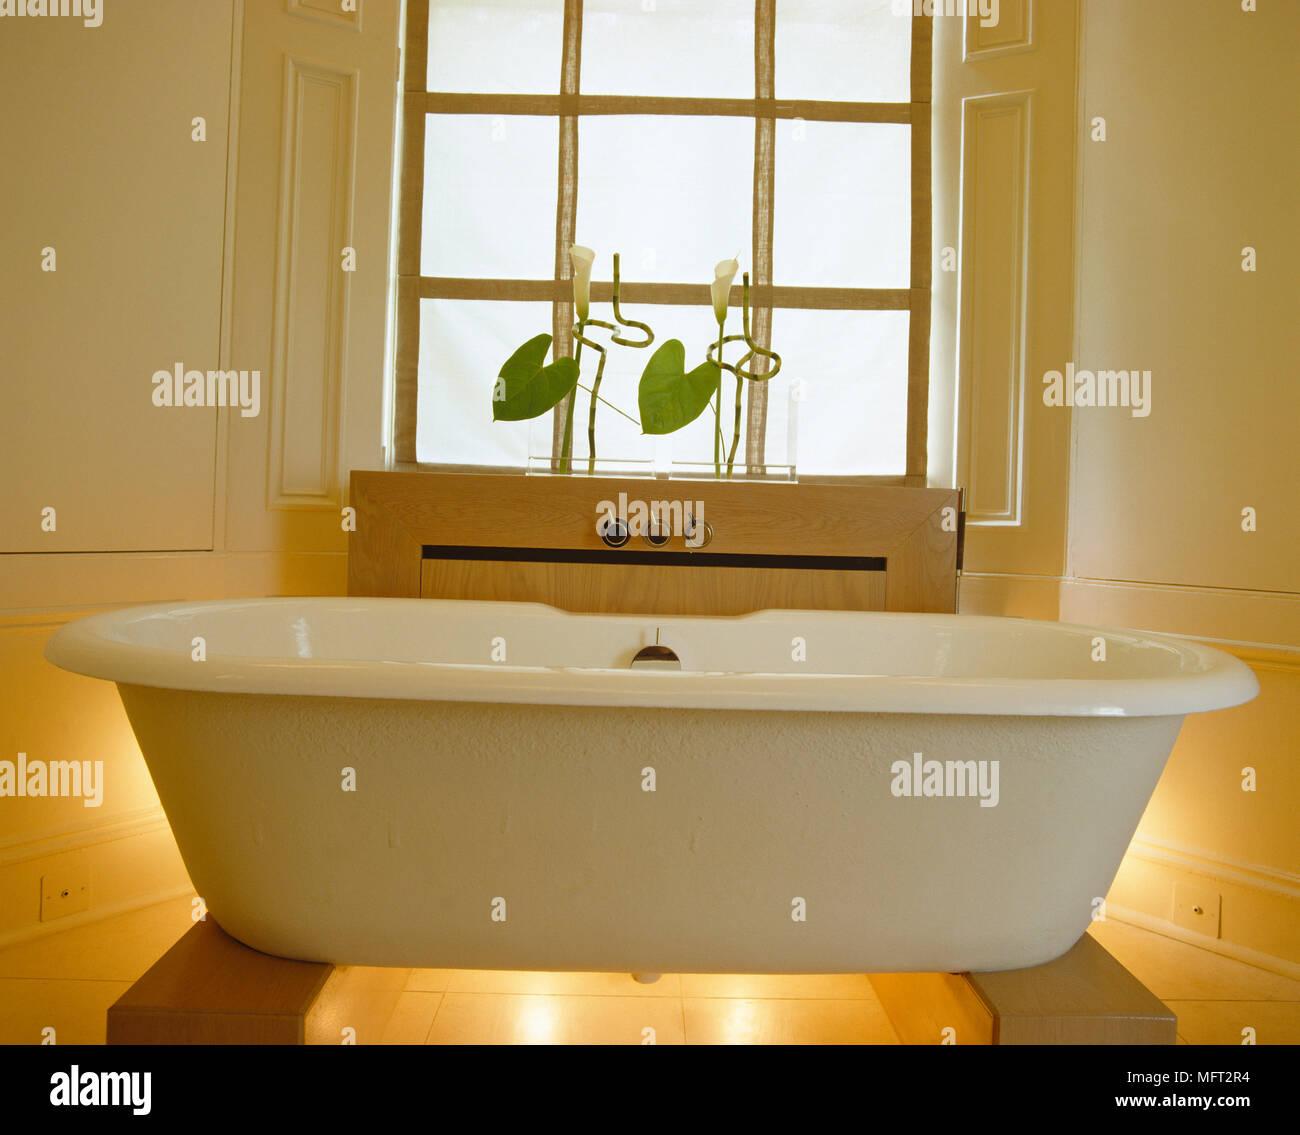 Freestanding roll top bath tub in front of window in yellow bathroom ...